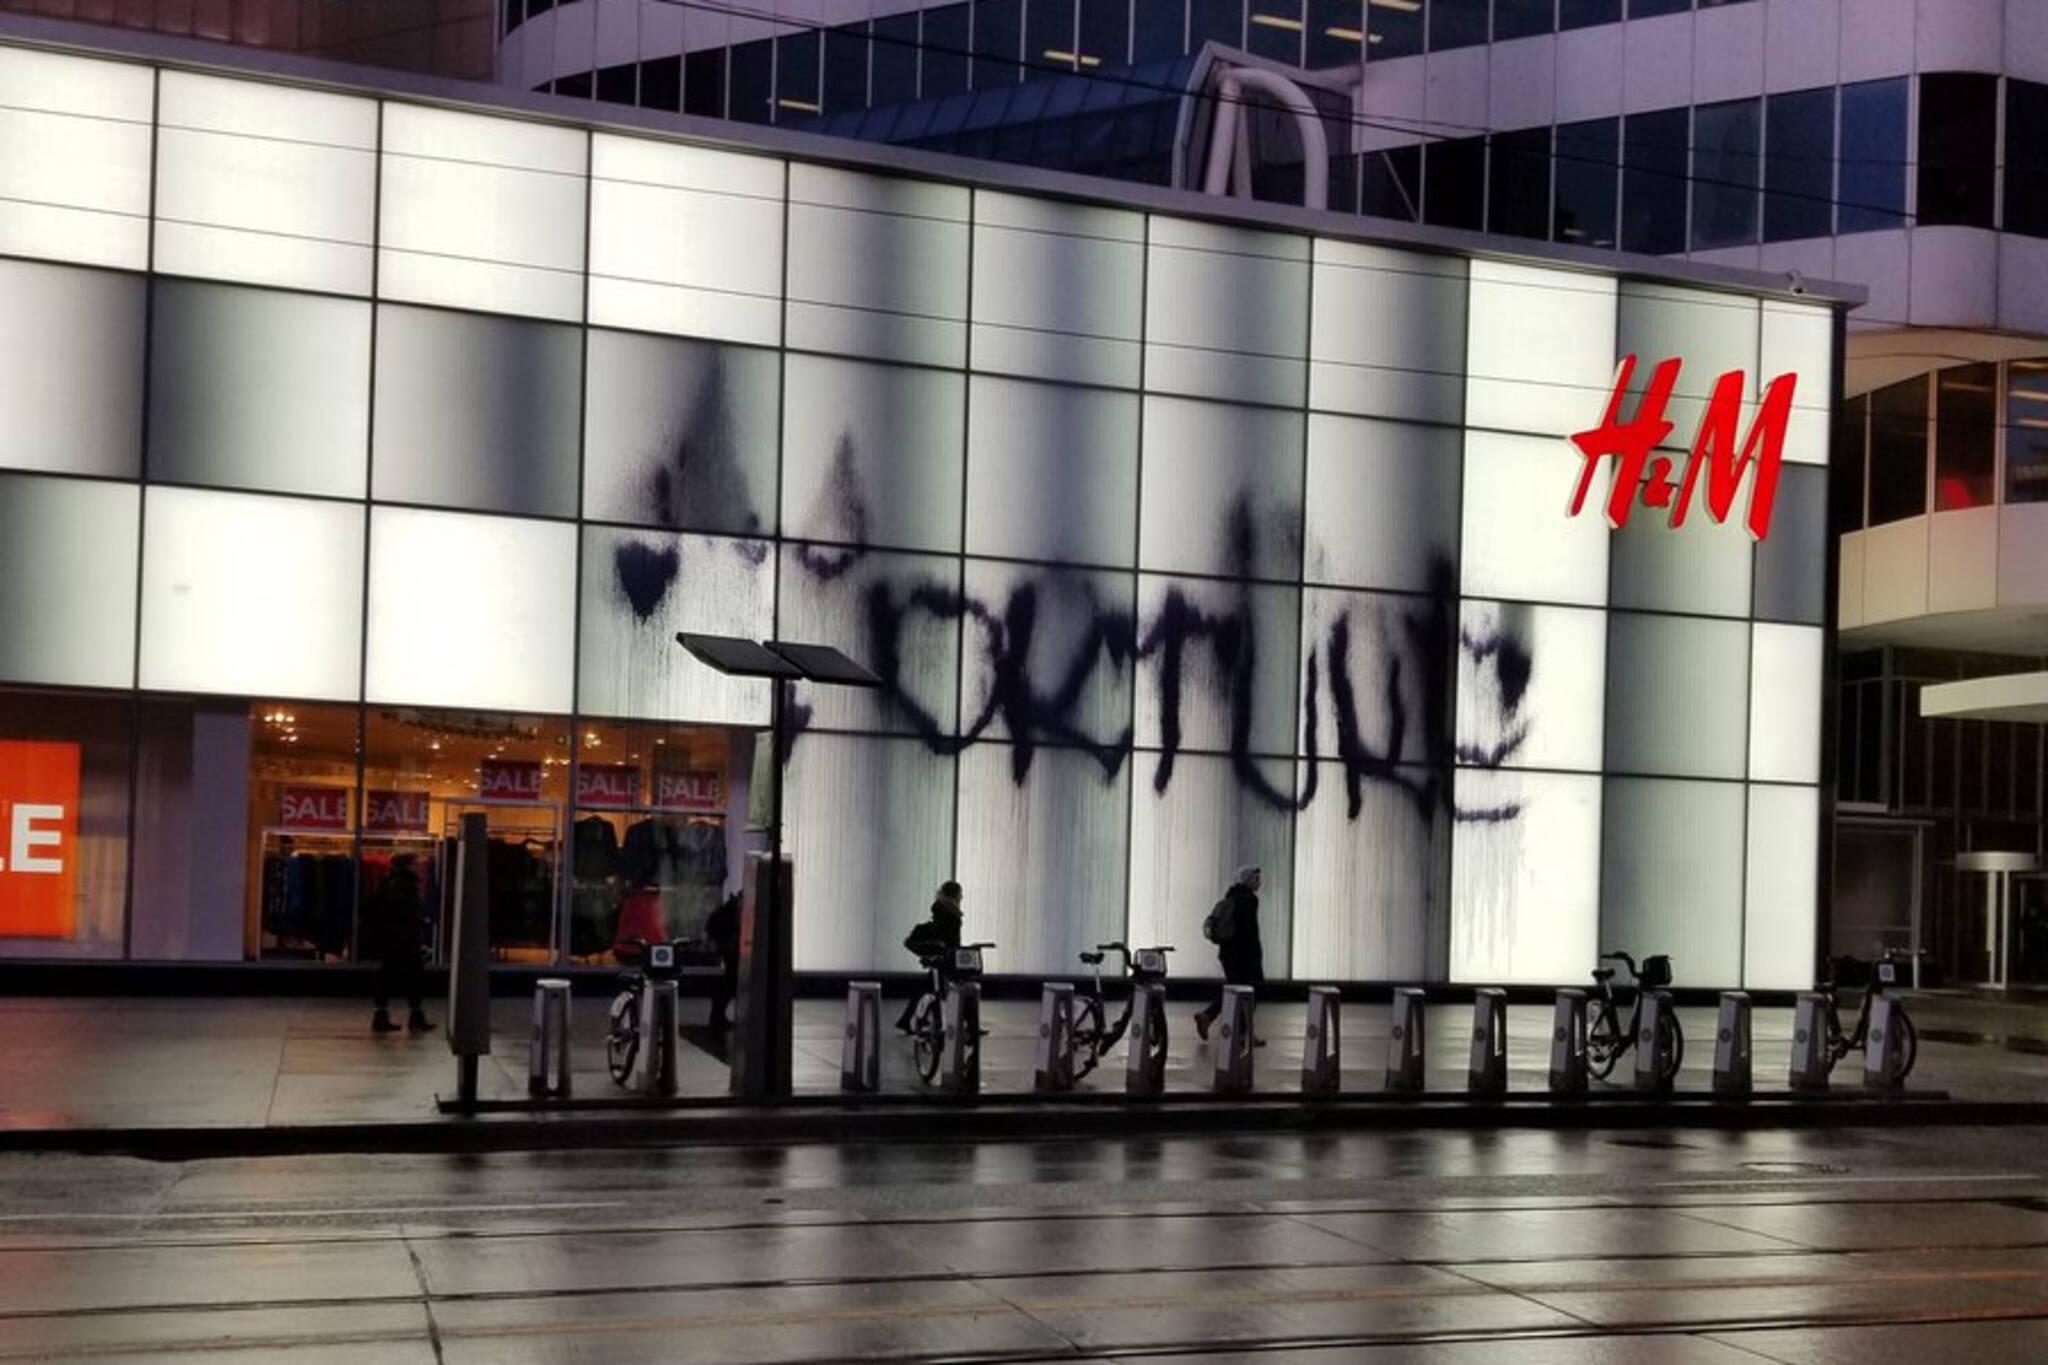 handm vandalized toronto